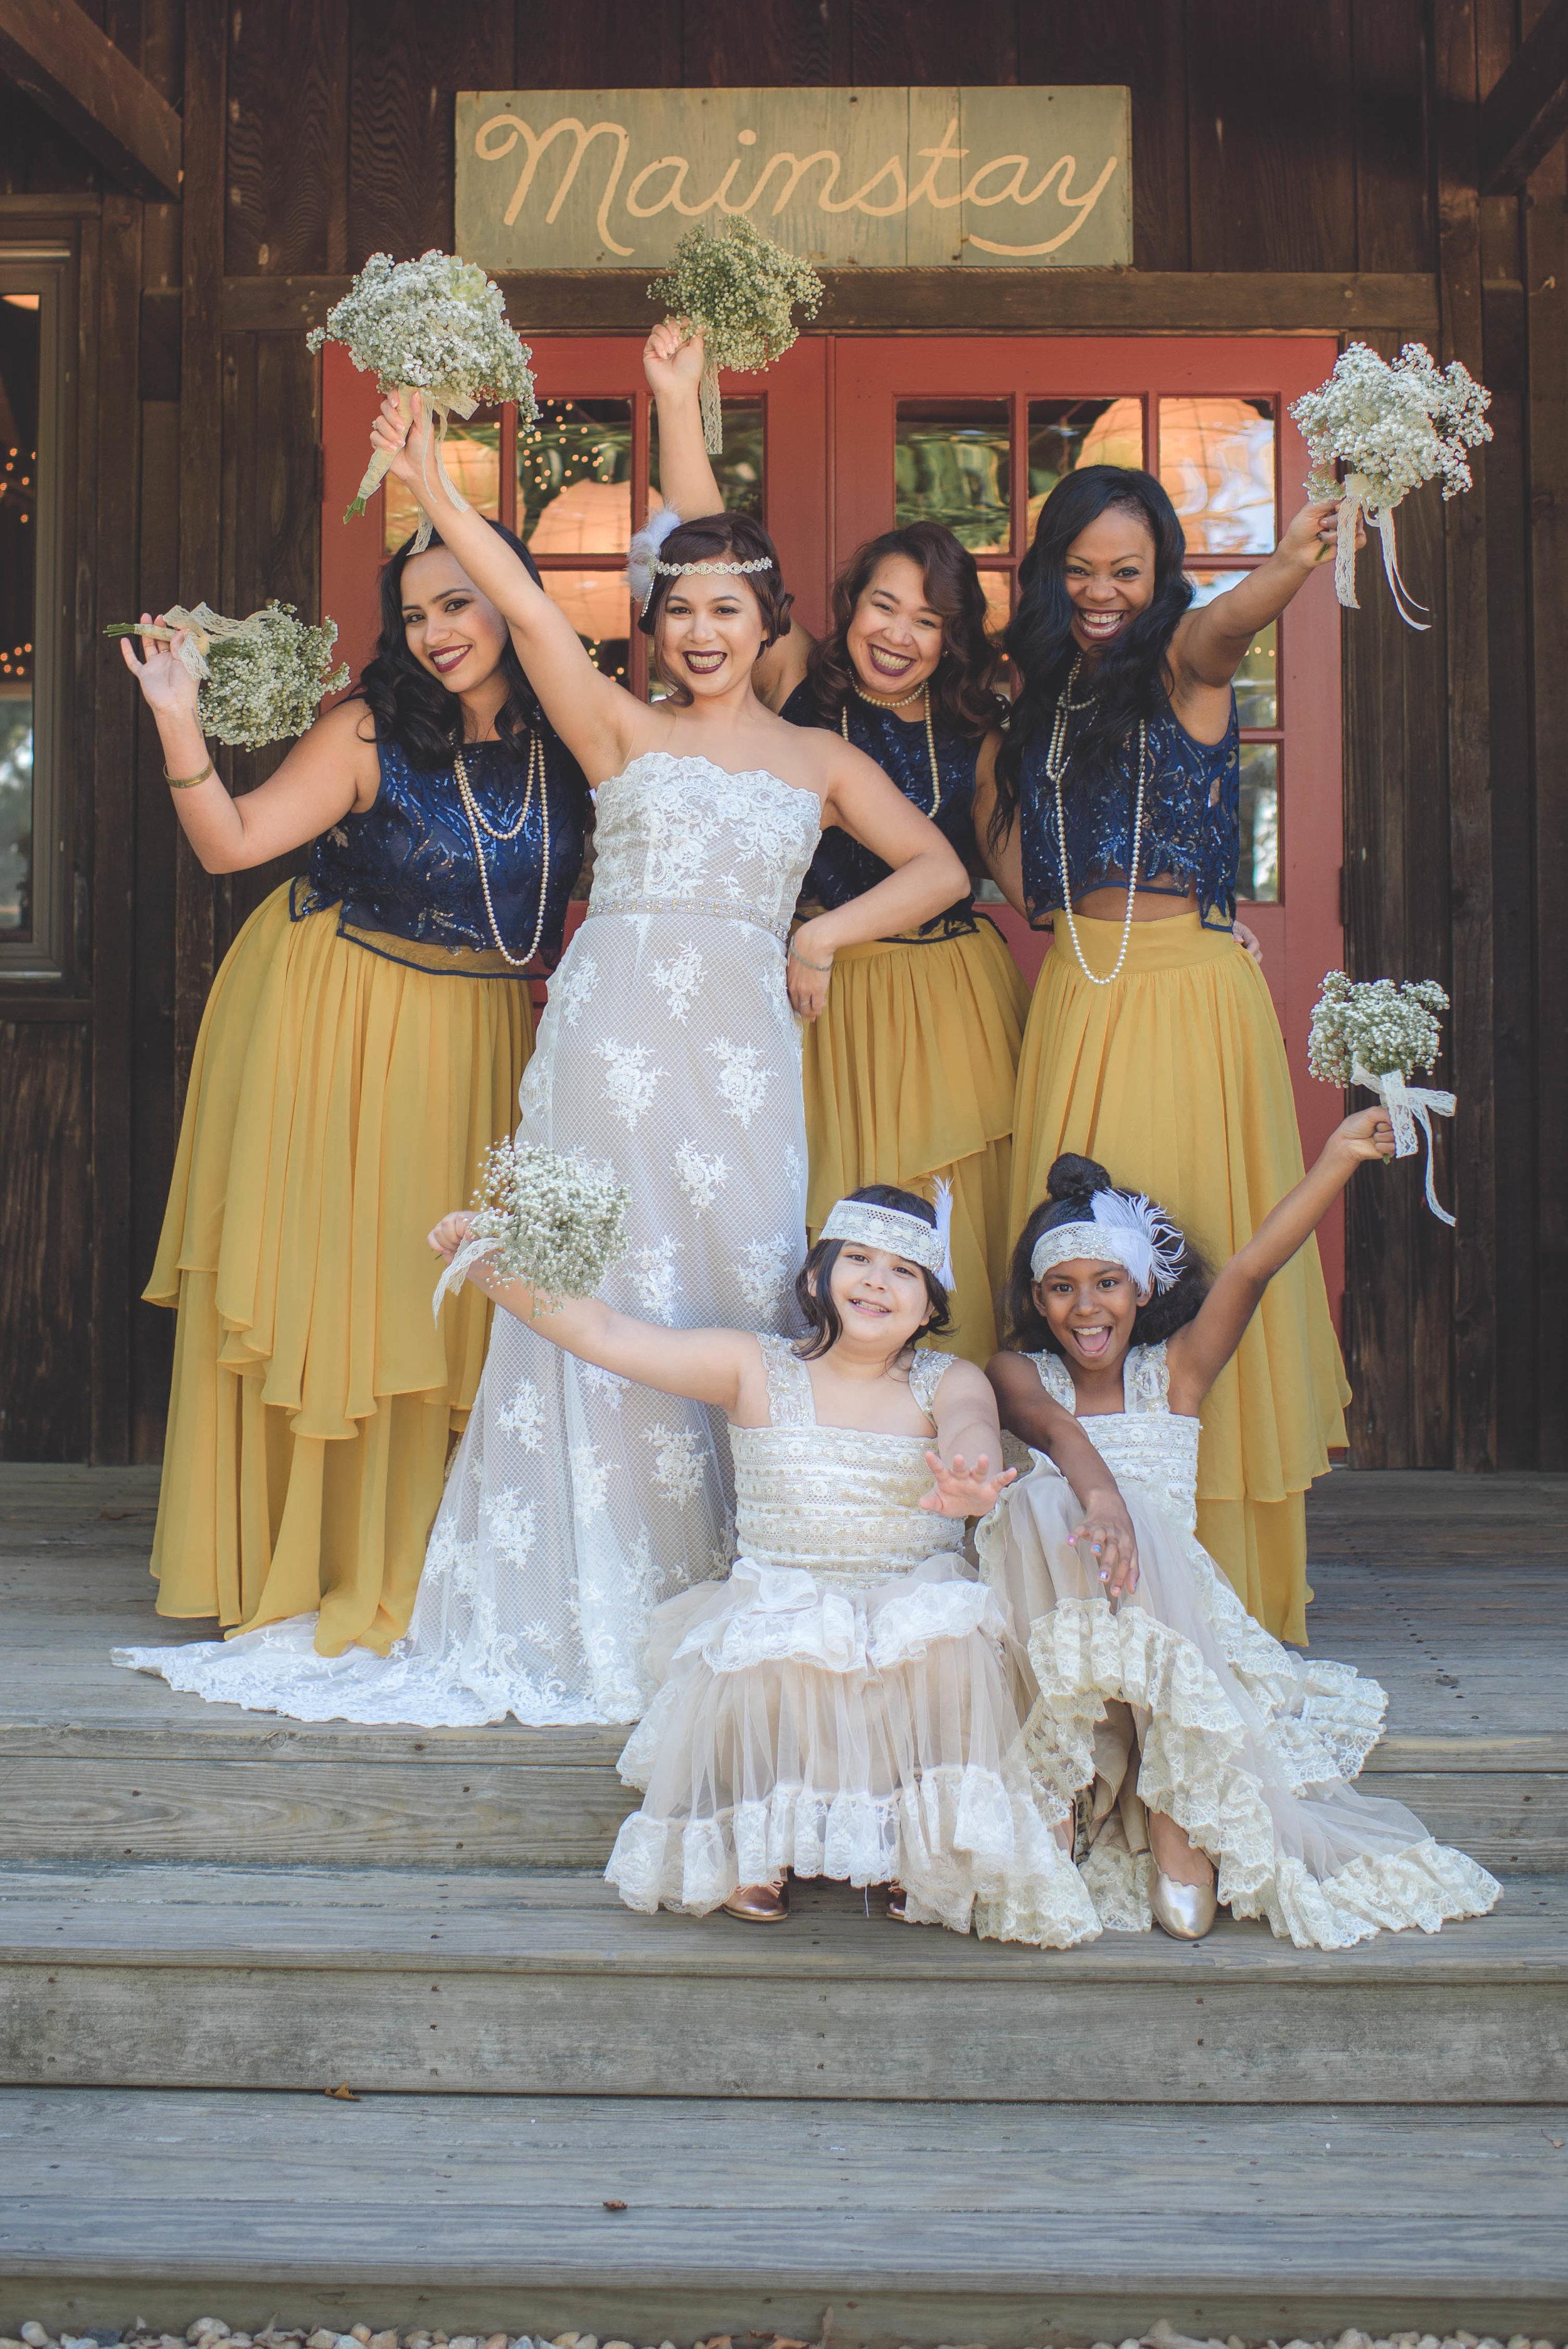 martha's vineyard wedding photographer, Los Angeles Wedding Photographer, Elopement Photographer, Destination Wedding Photographer, Joshua Tree Wedding Photographer, Palm Springs Wedding Photographer